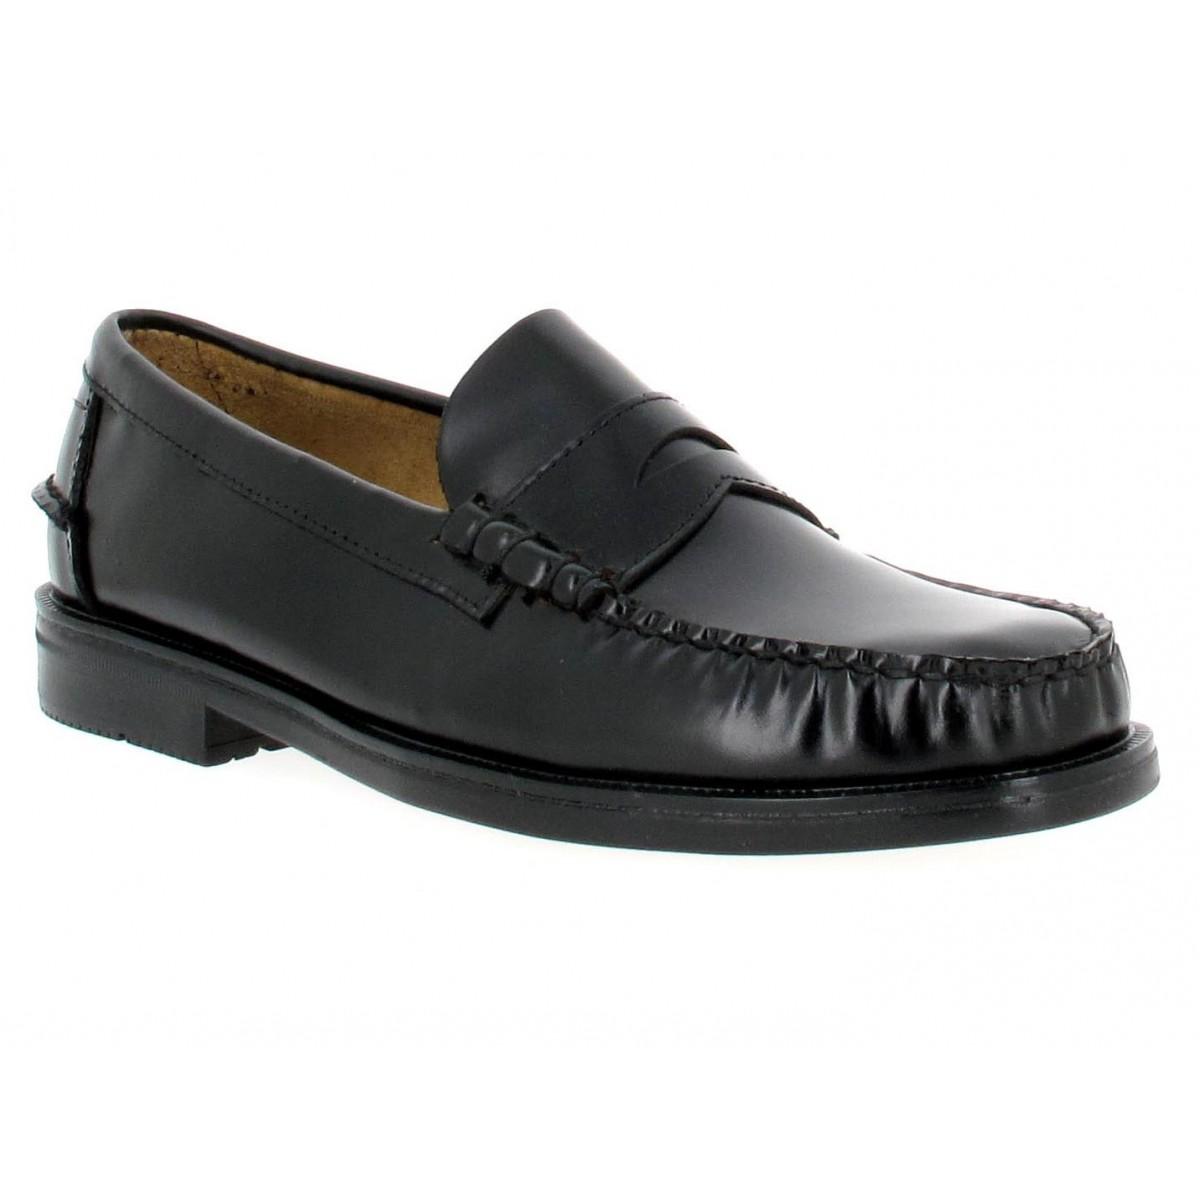 sebago grant homme noir fanny chaussures. Black Bedroom Furniture Sets. Home Design Ideas